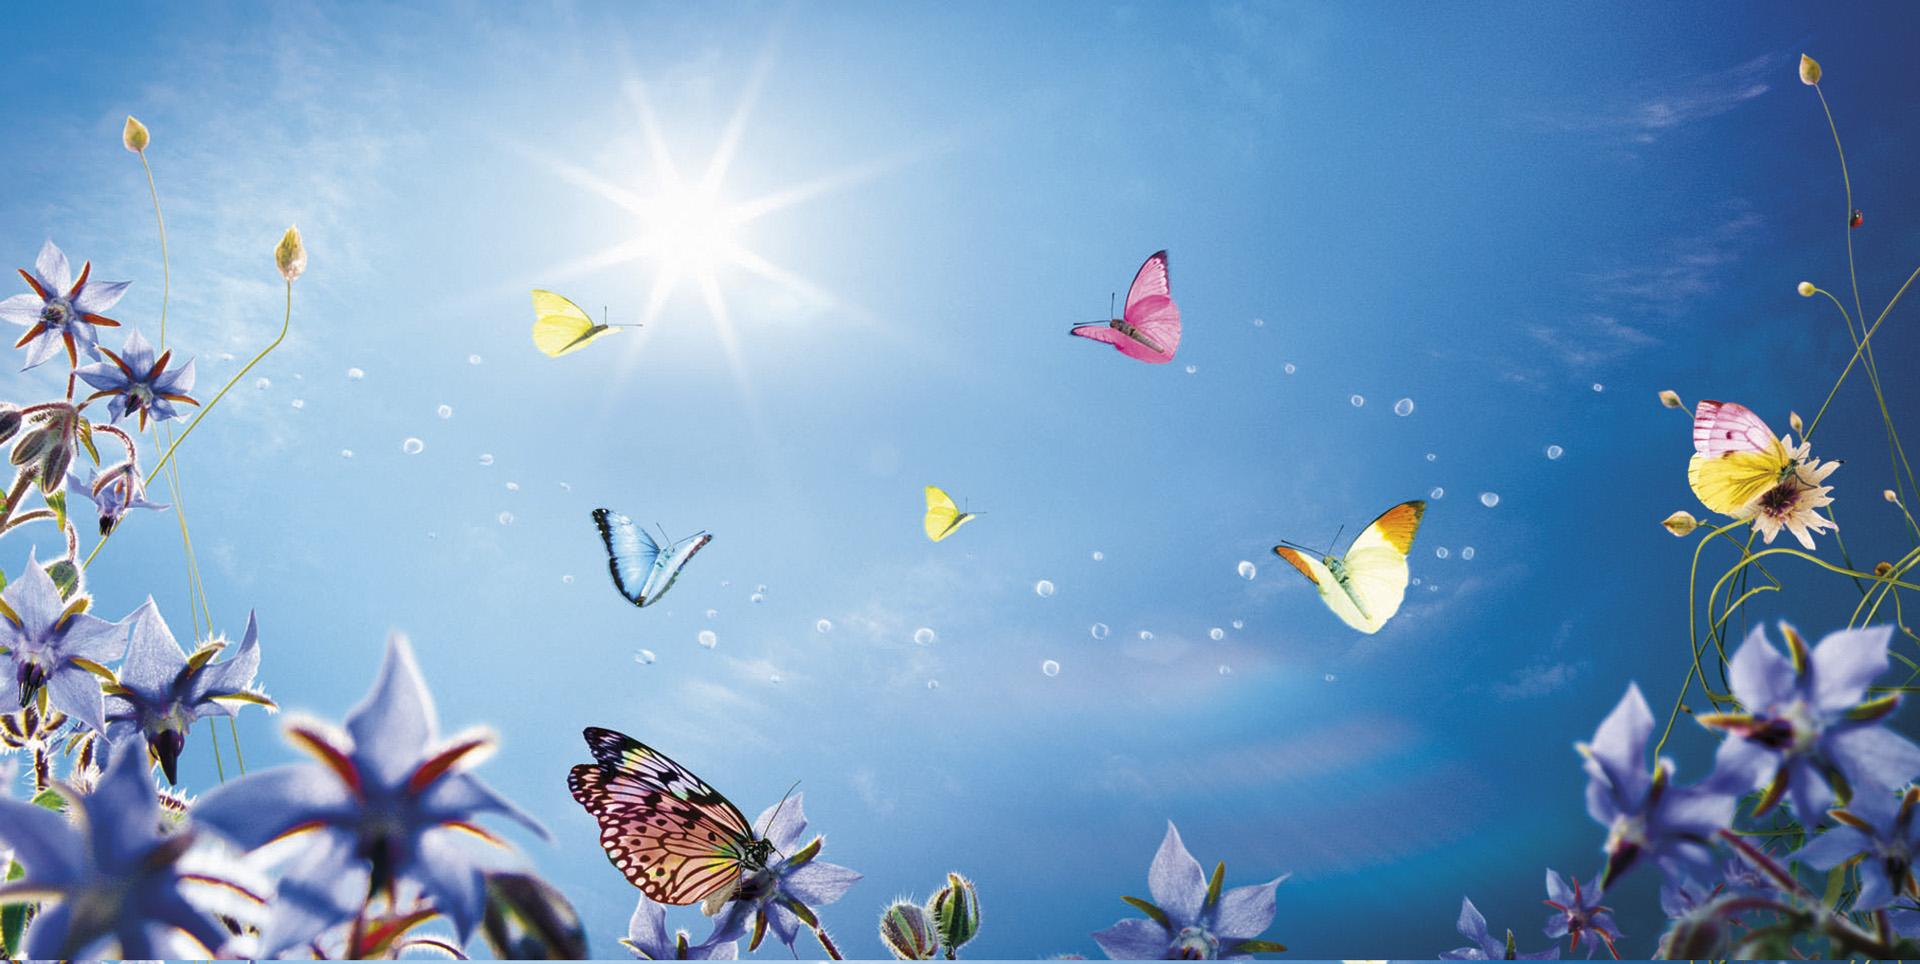 Nadege_Butterflies